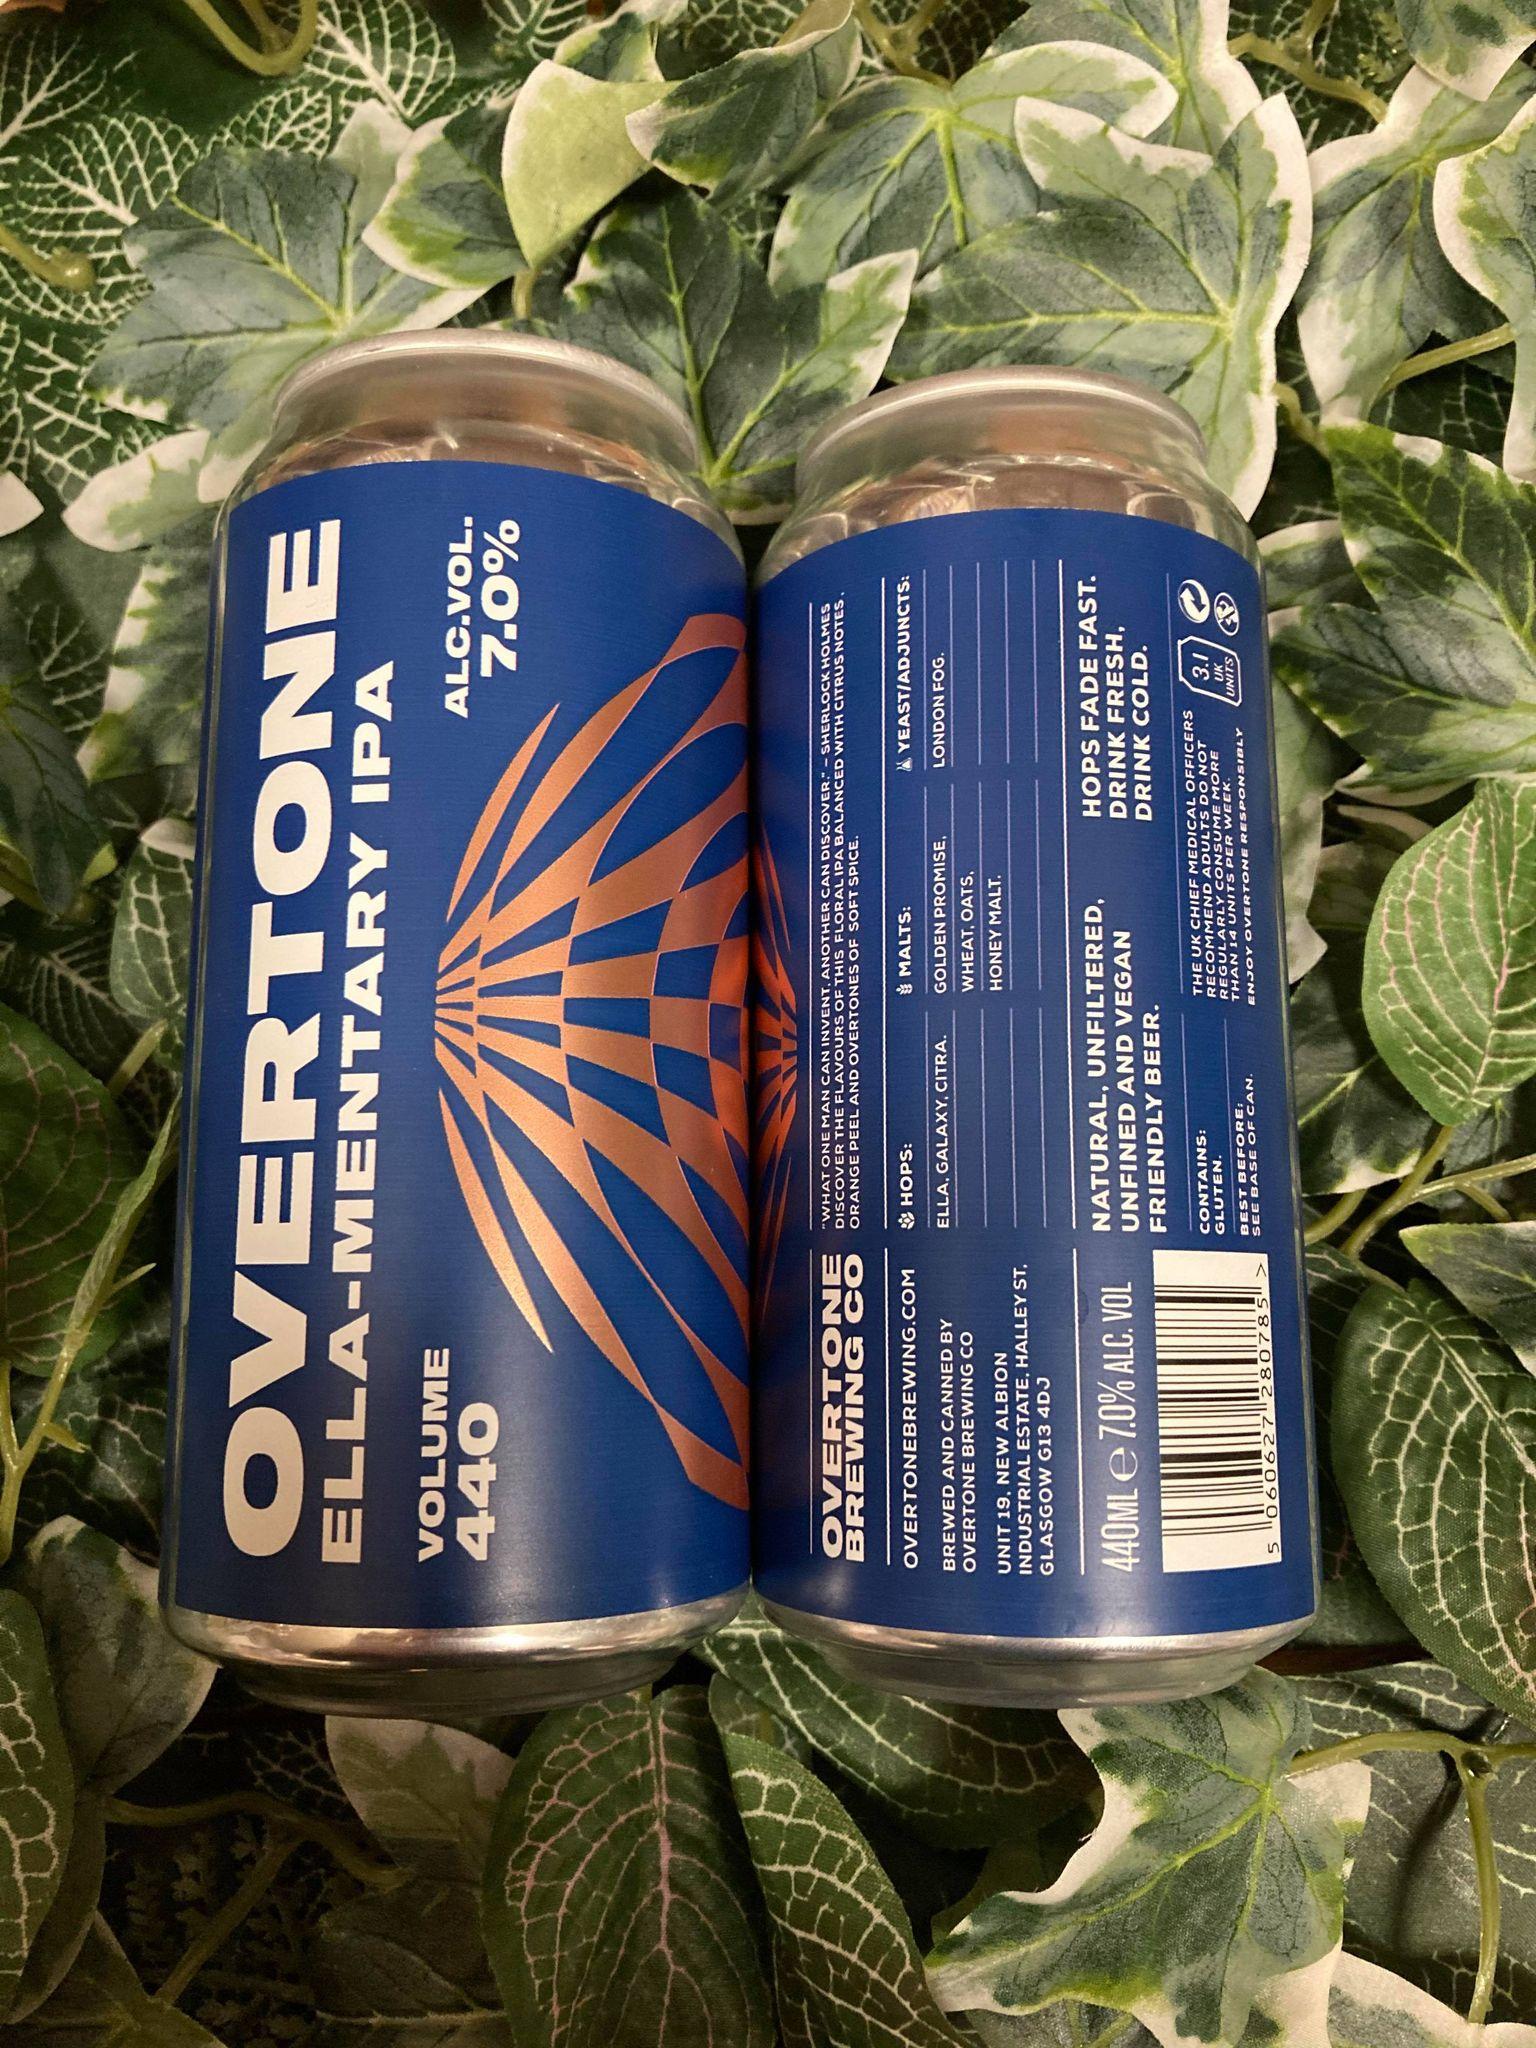 Overtone - Ella-Mentary 7%